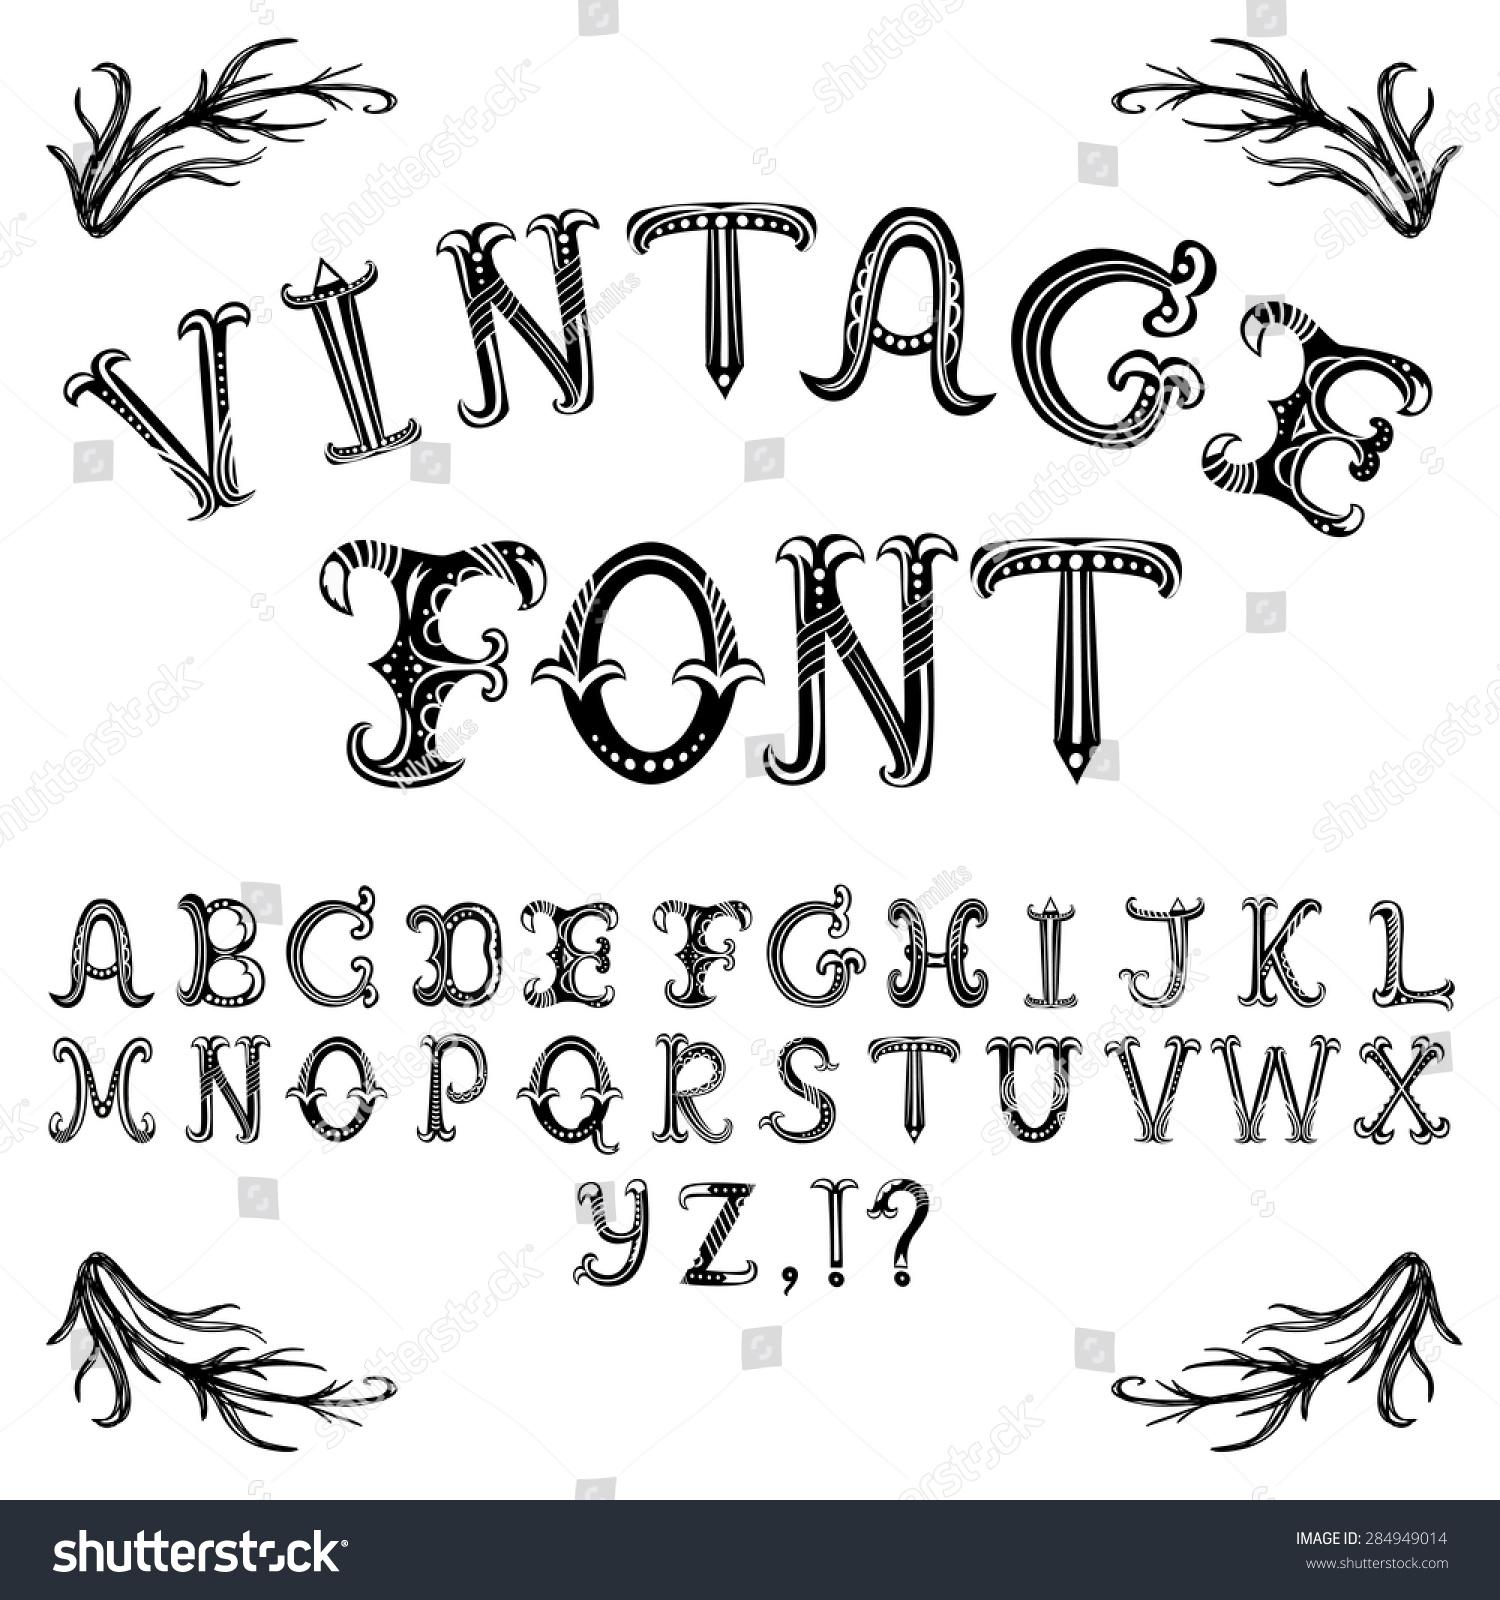 Vector Hand Drawn Decorative Vintage Abc Stock Vector